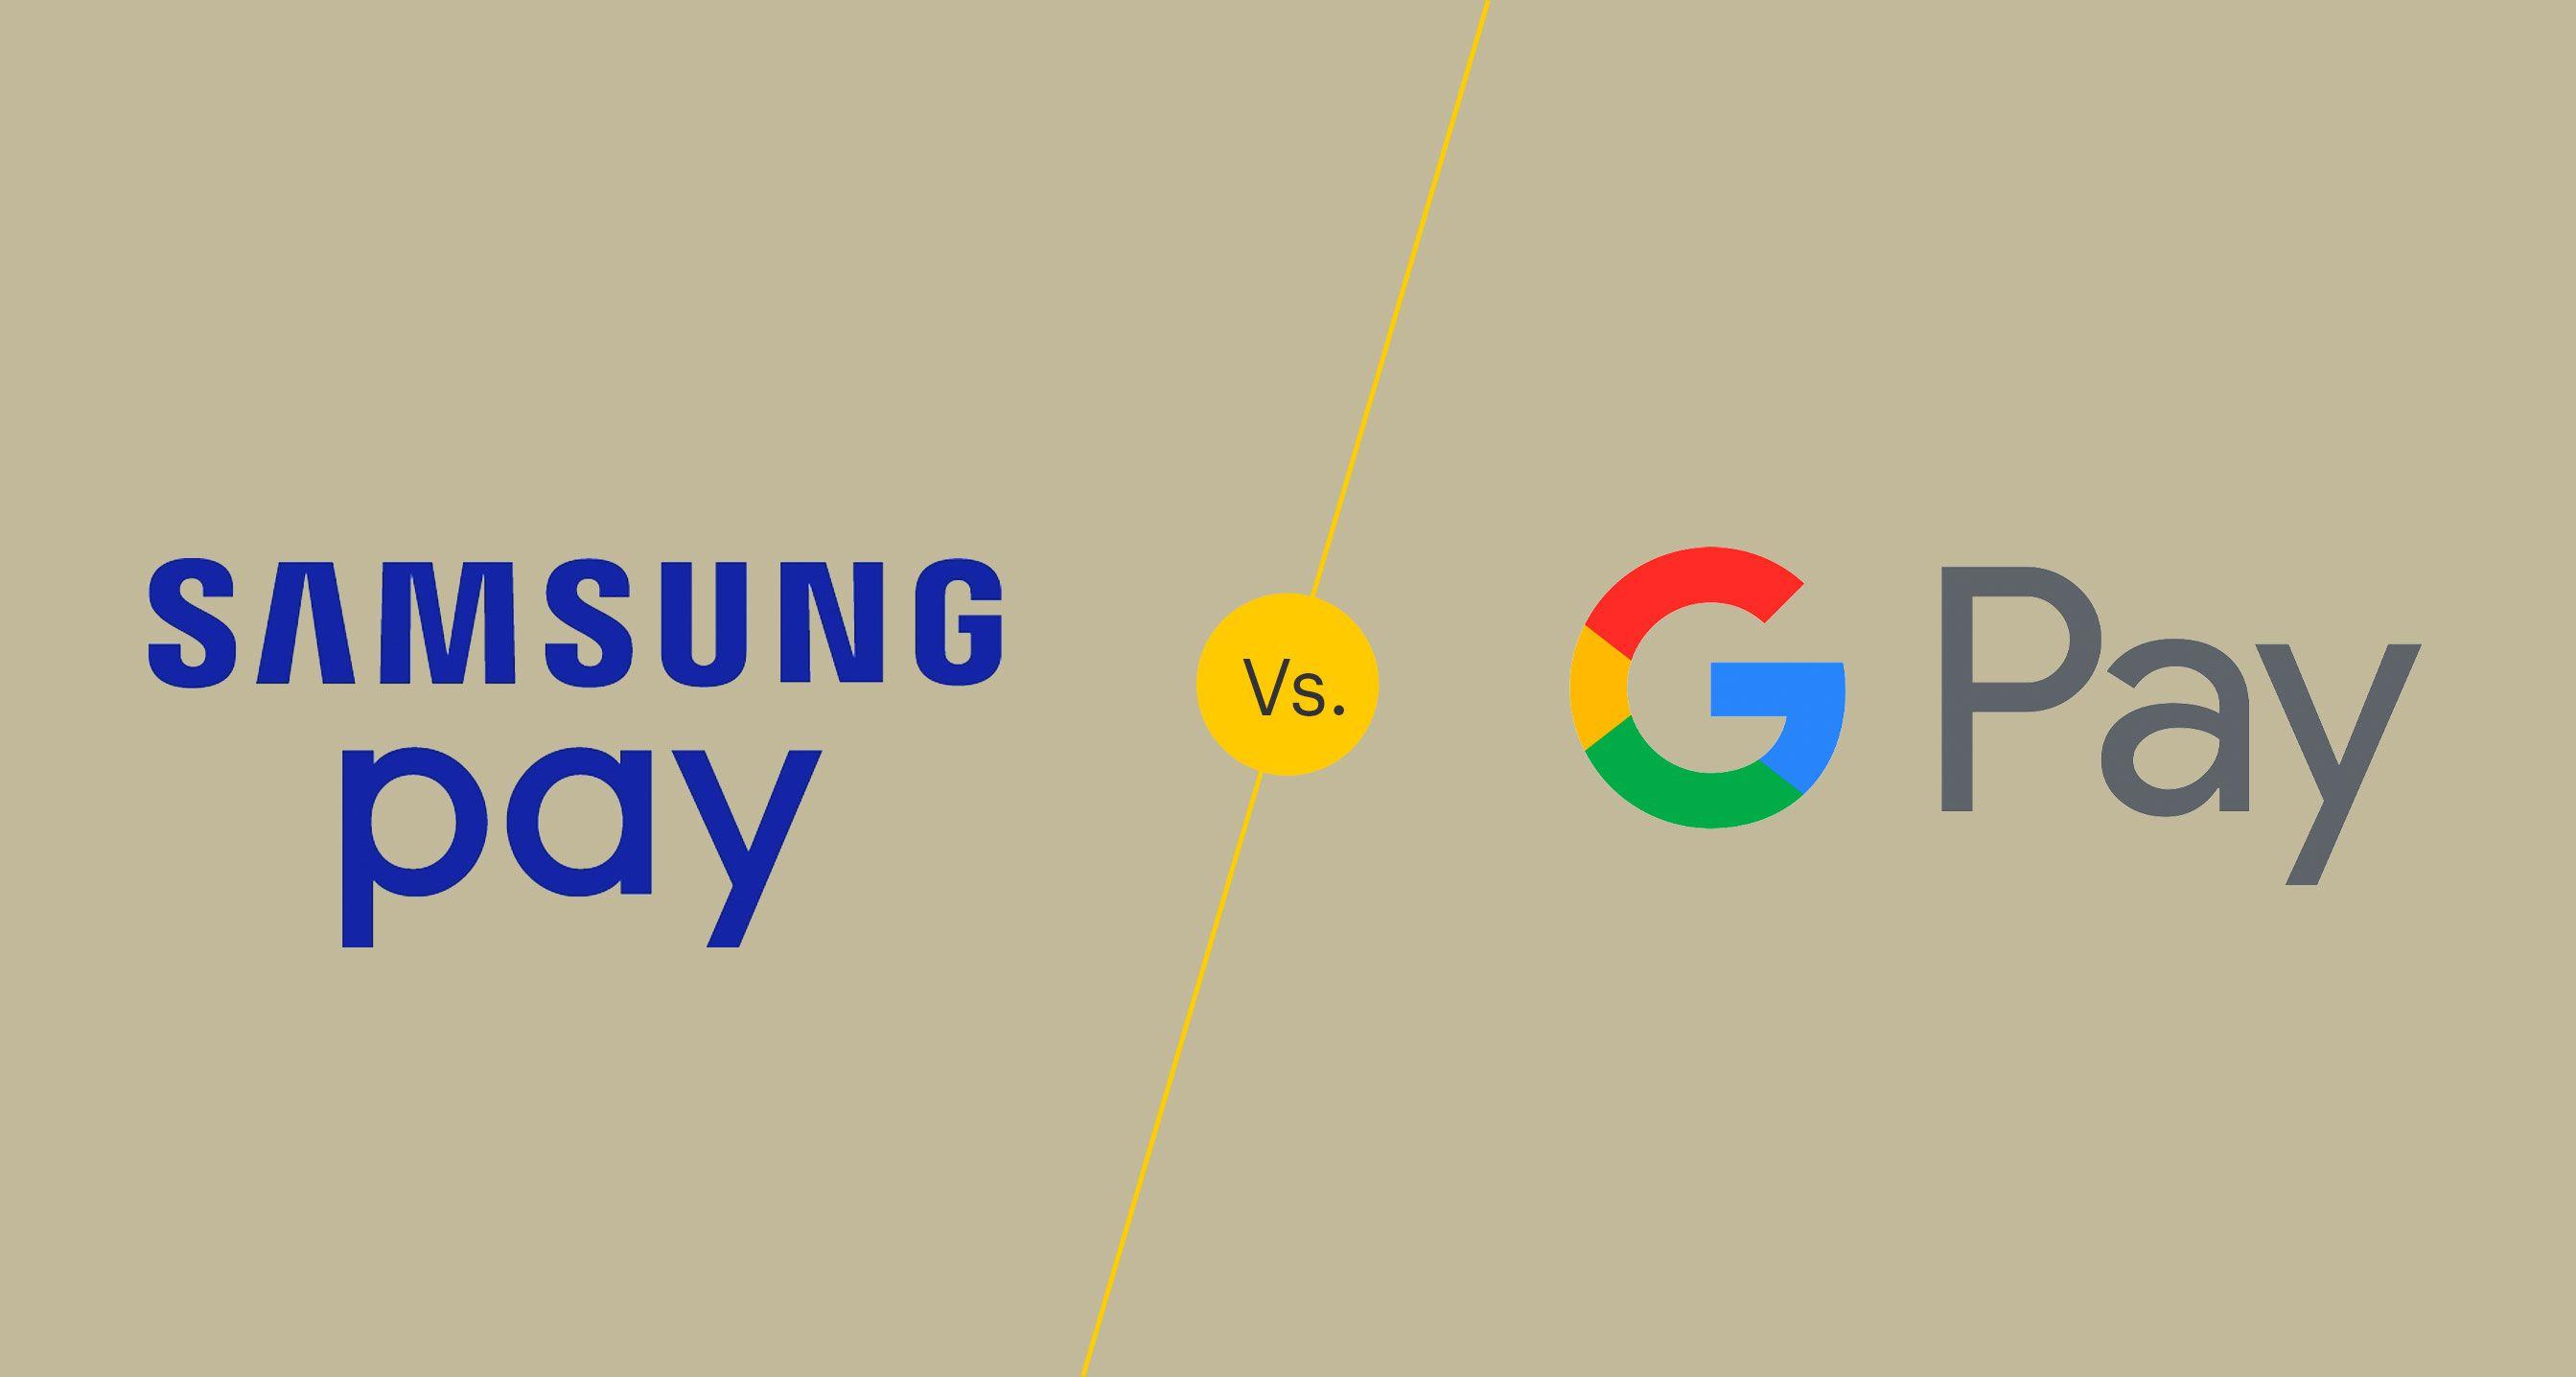 Samsung Pay vs. Google Pay